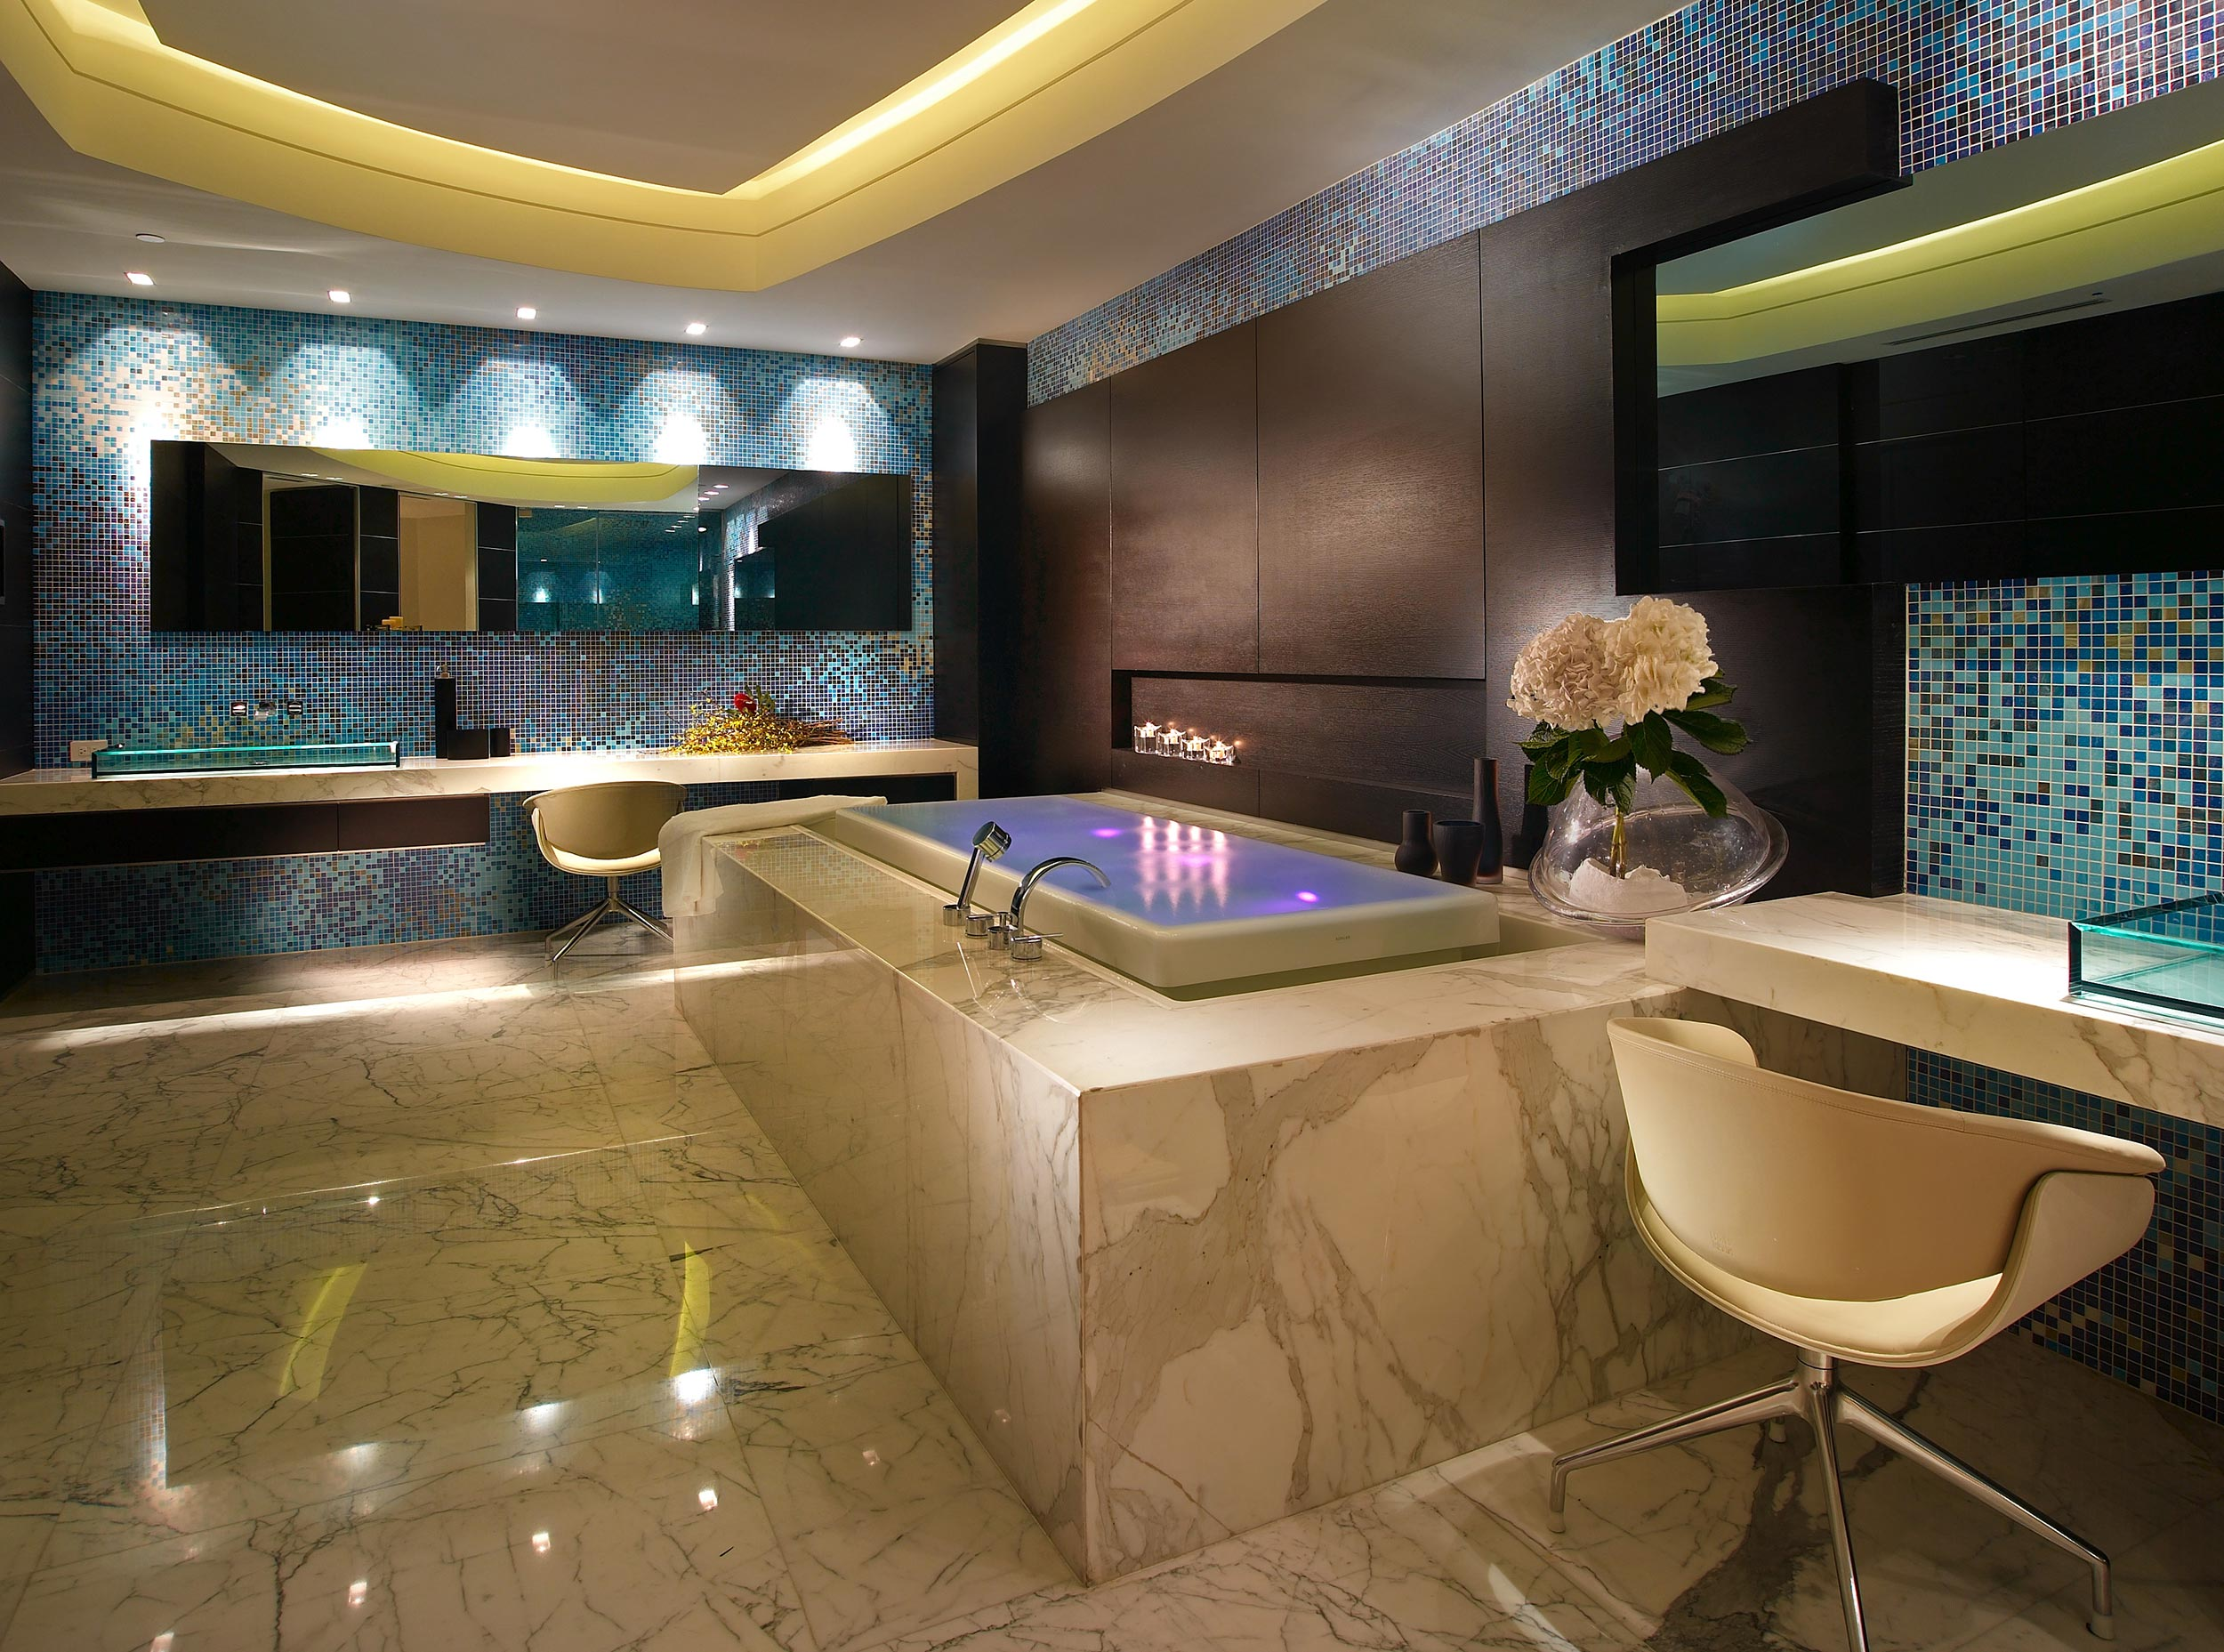 Luxury bathroom with marble bathtub